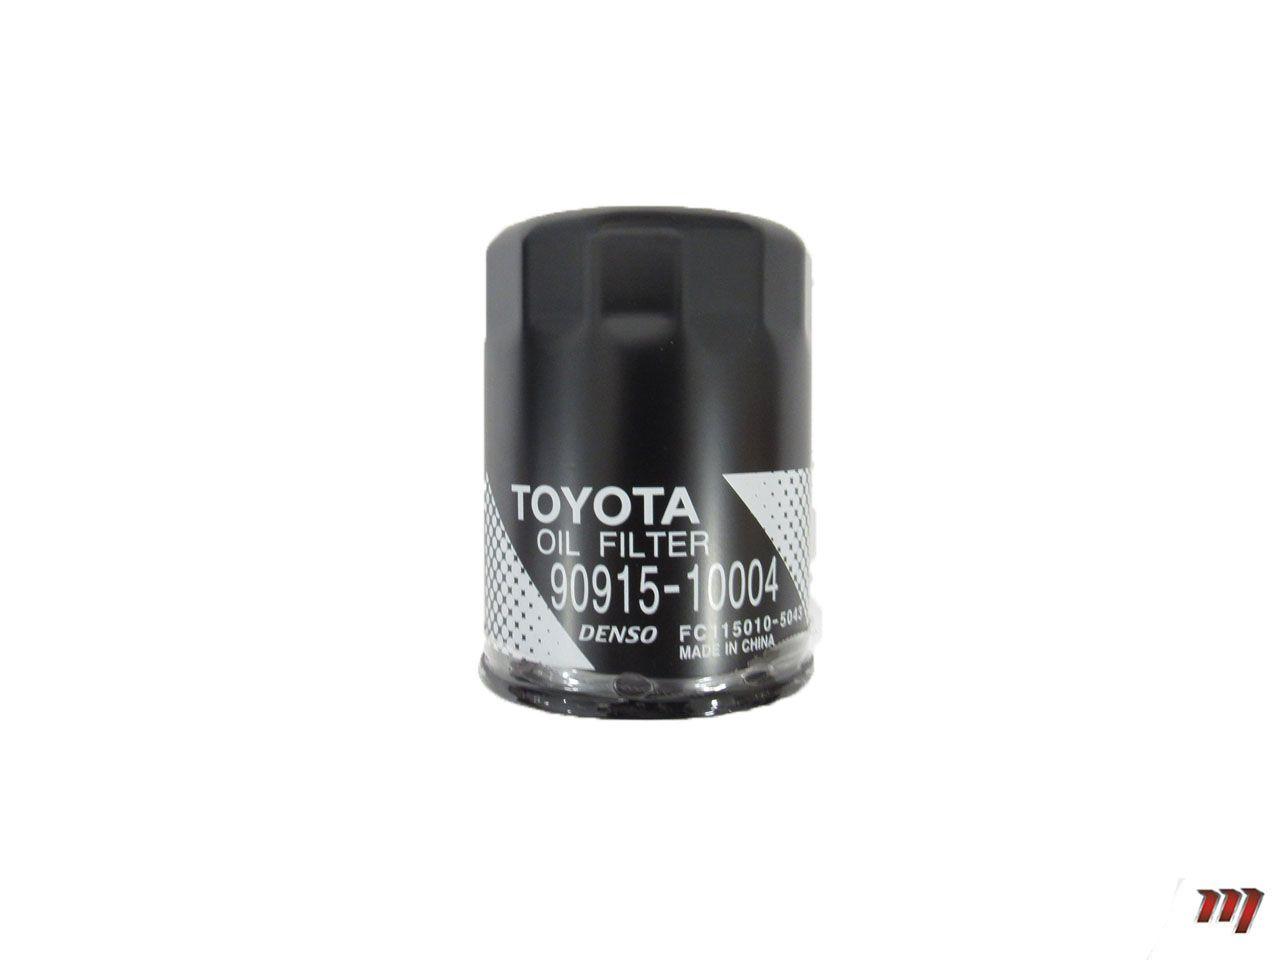 Filtro de Óleo Camry 2006 a 2011   - Mirai Peças Toyota